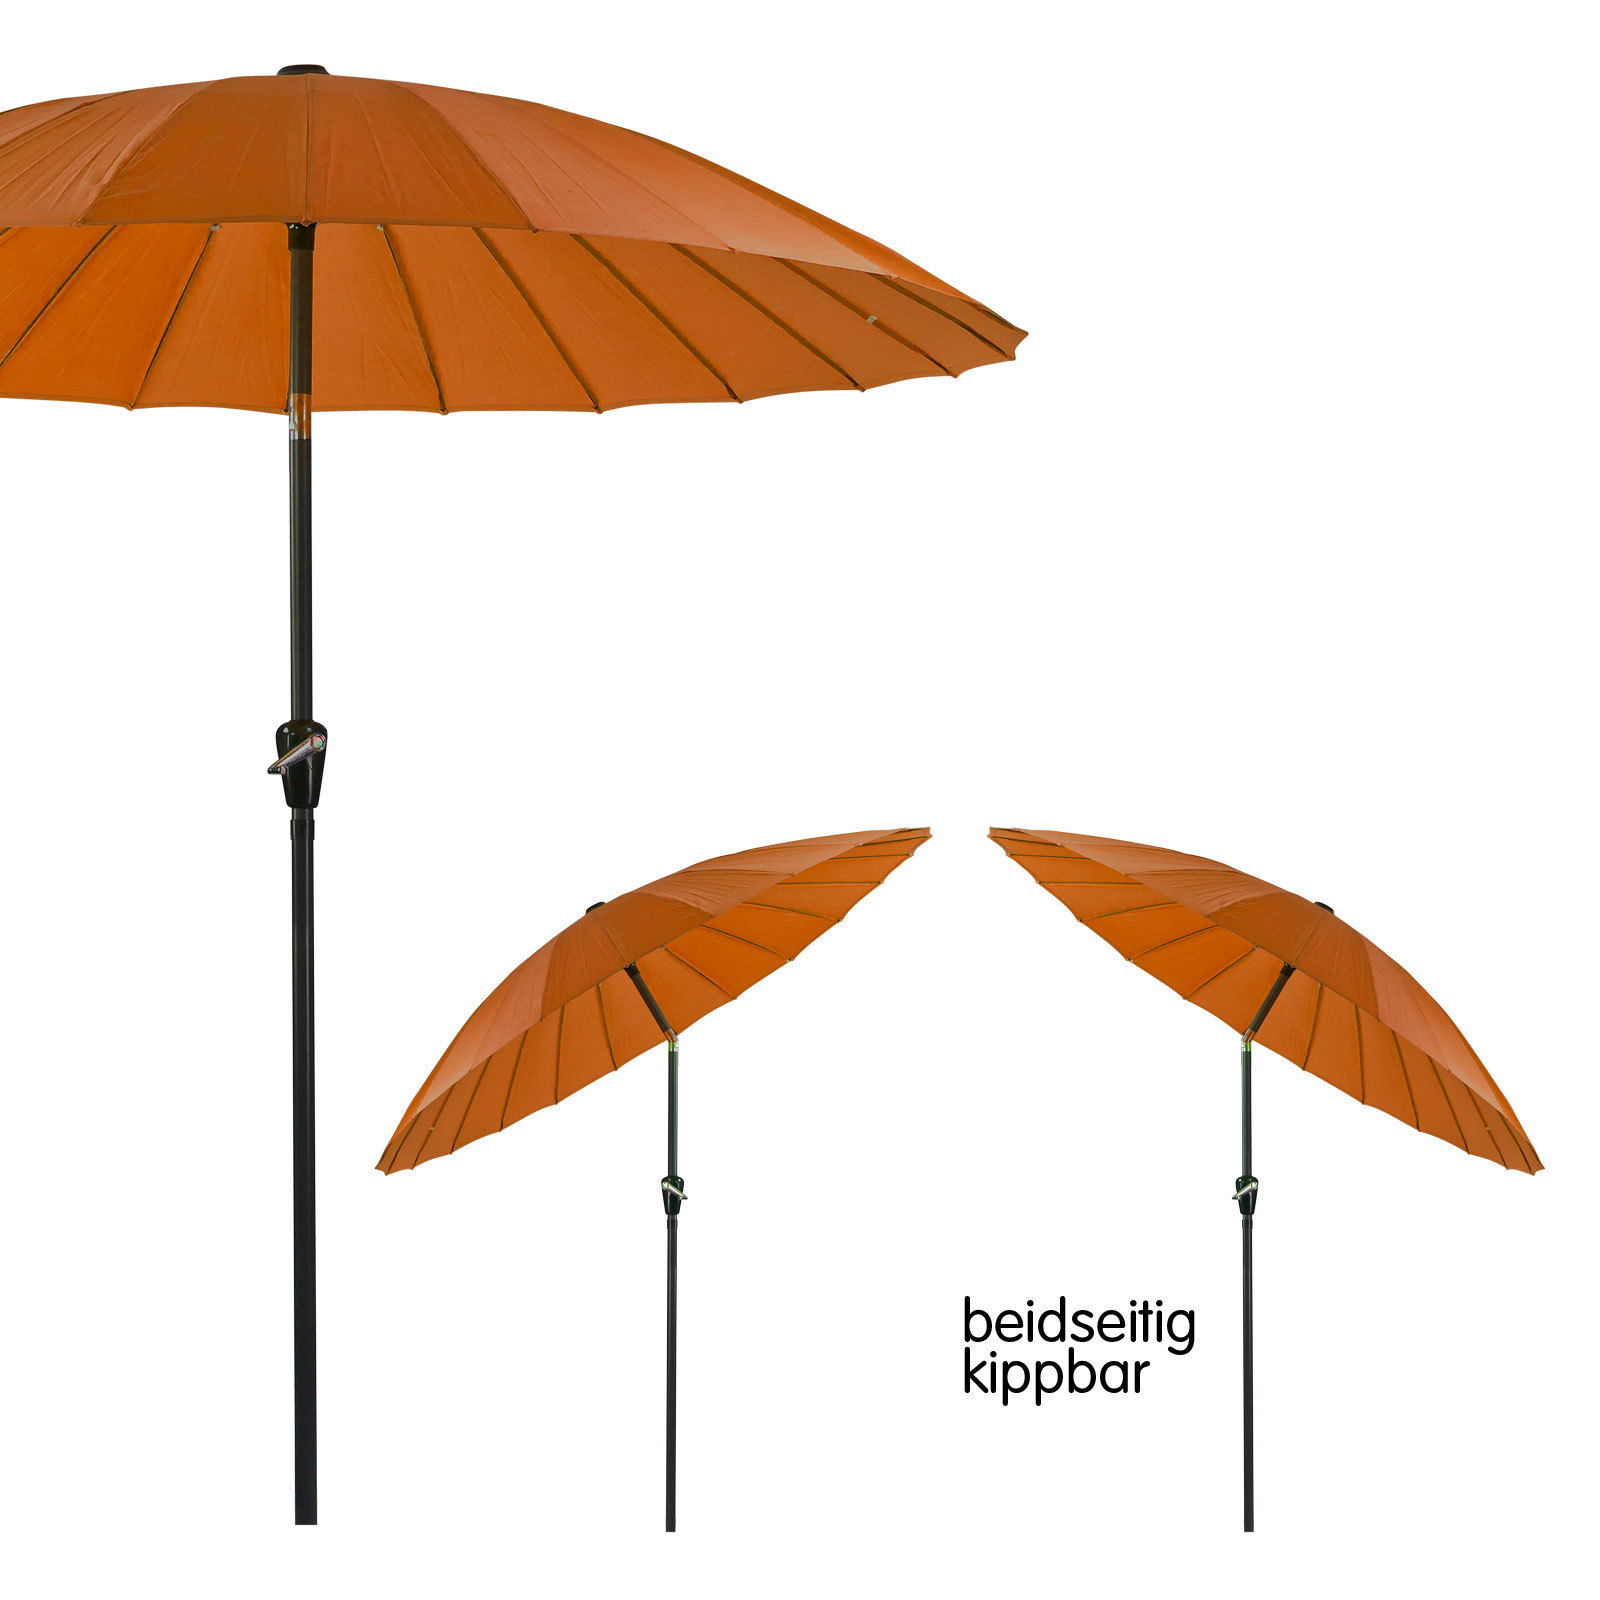 sonnenschirm gartenschirm sonnenschutz kurbelschirm rund 2 5m terracotta ebay. Black Bedroom Furniture Sets. Home Design Ideas